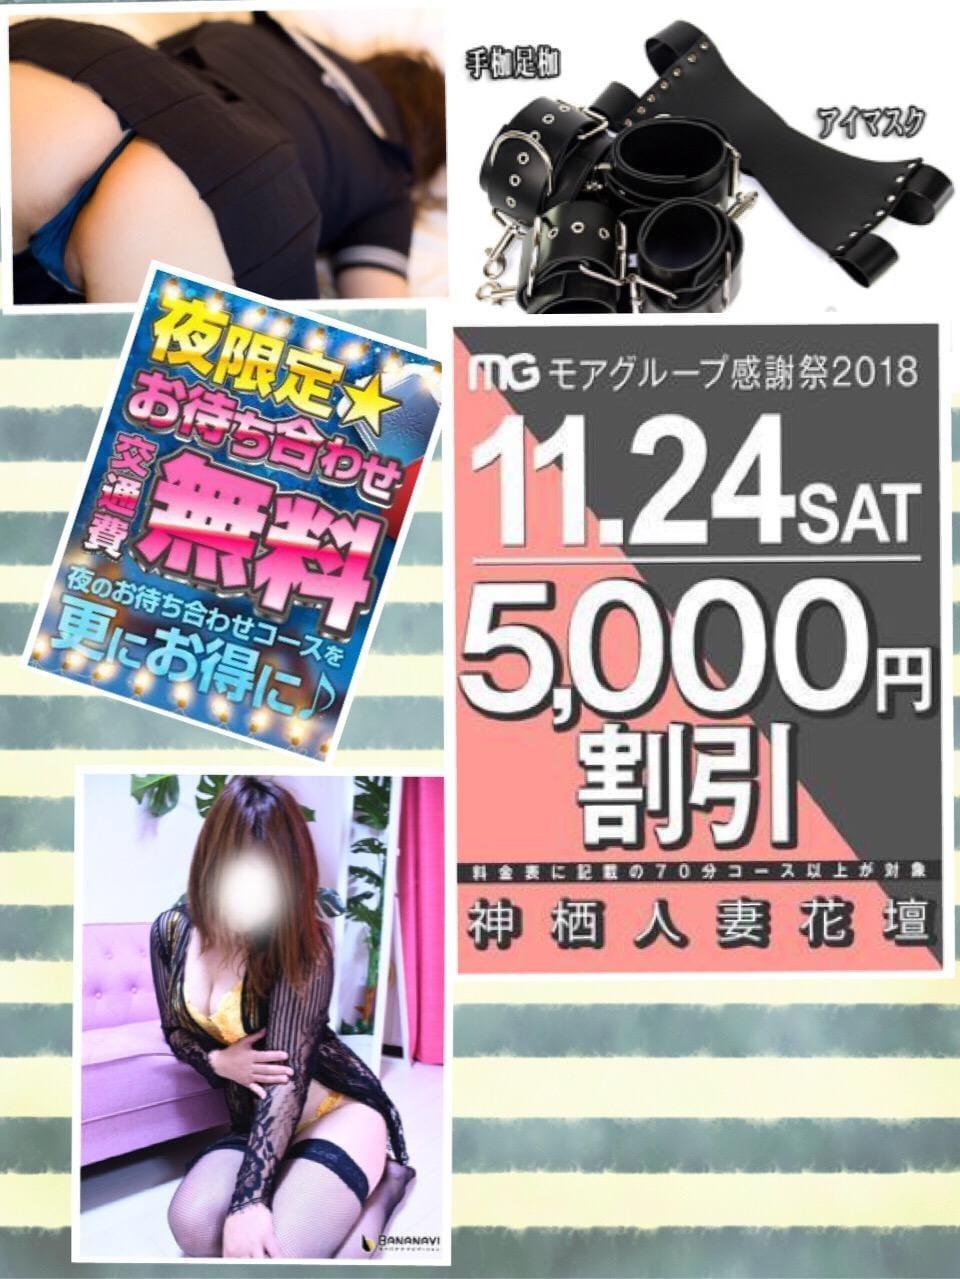 https://s3-ap-northeast-1.amazonaws.com/files.deli-fuzoku.jp/img/shop/hkadankamisu/diary/34254345/d_0_20181123183041528.jpeg